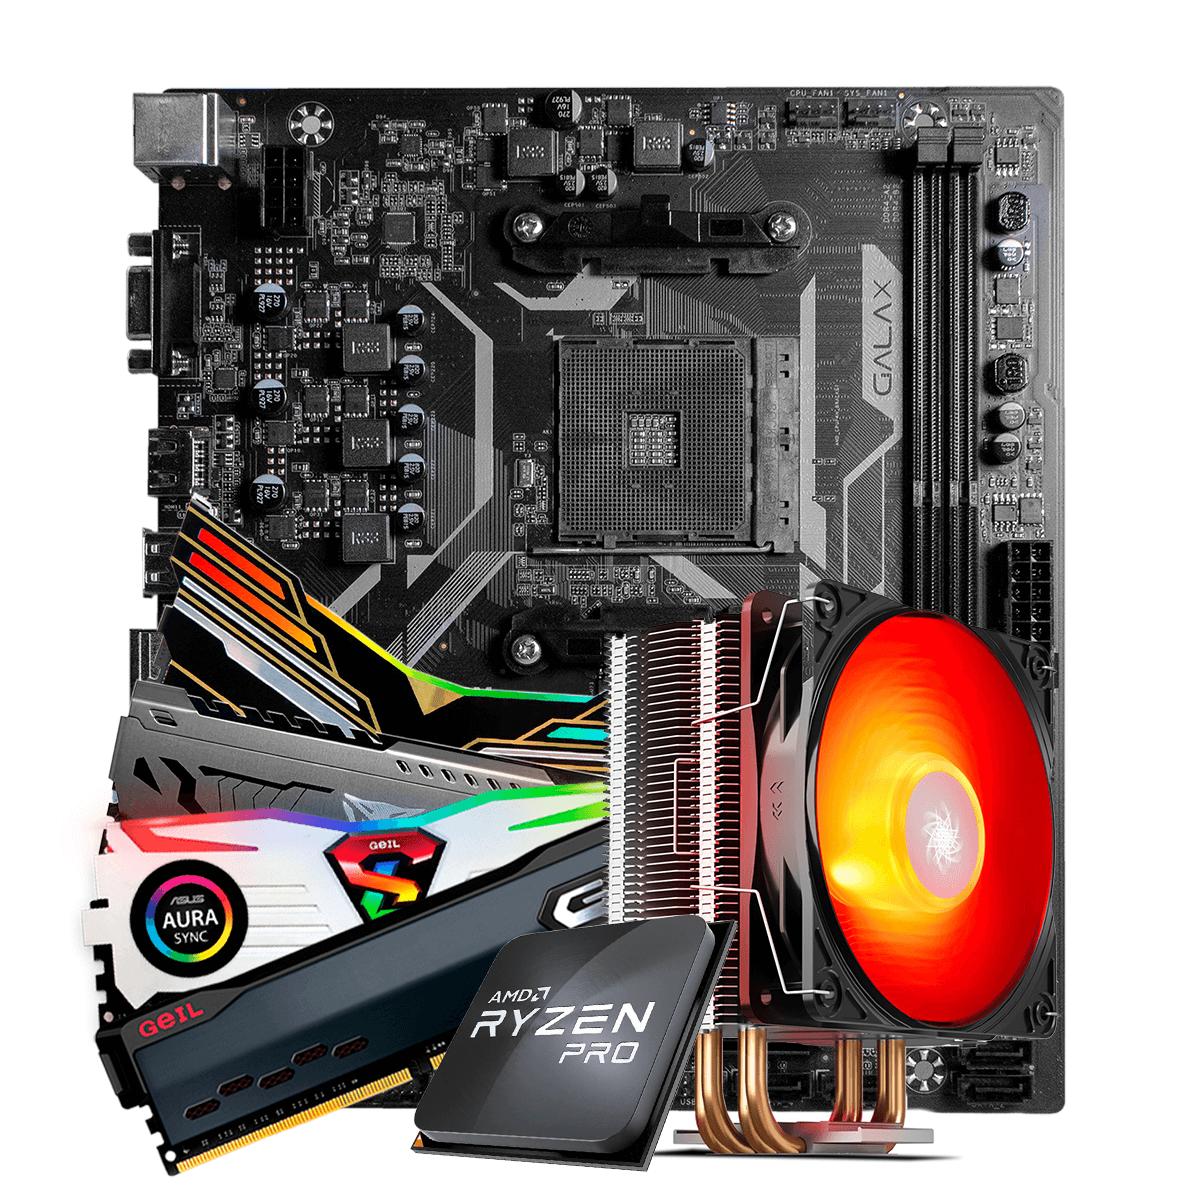 Kit Upgrade, AMD Ryzen 3 PRO 3200GE 3.8GHz Turbo + Cooler, + Galax A320M, + Memória DDR4 8GB 3000MHz